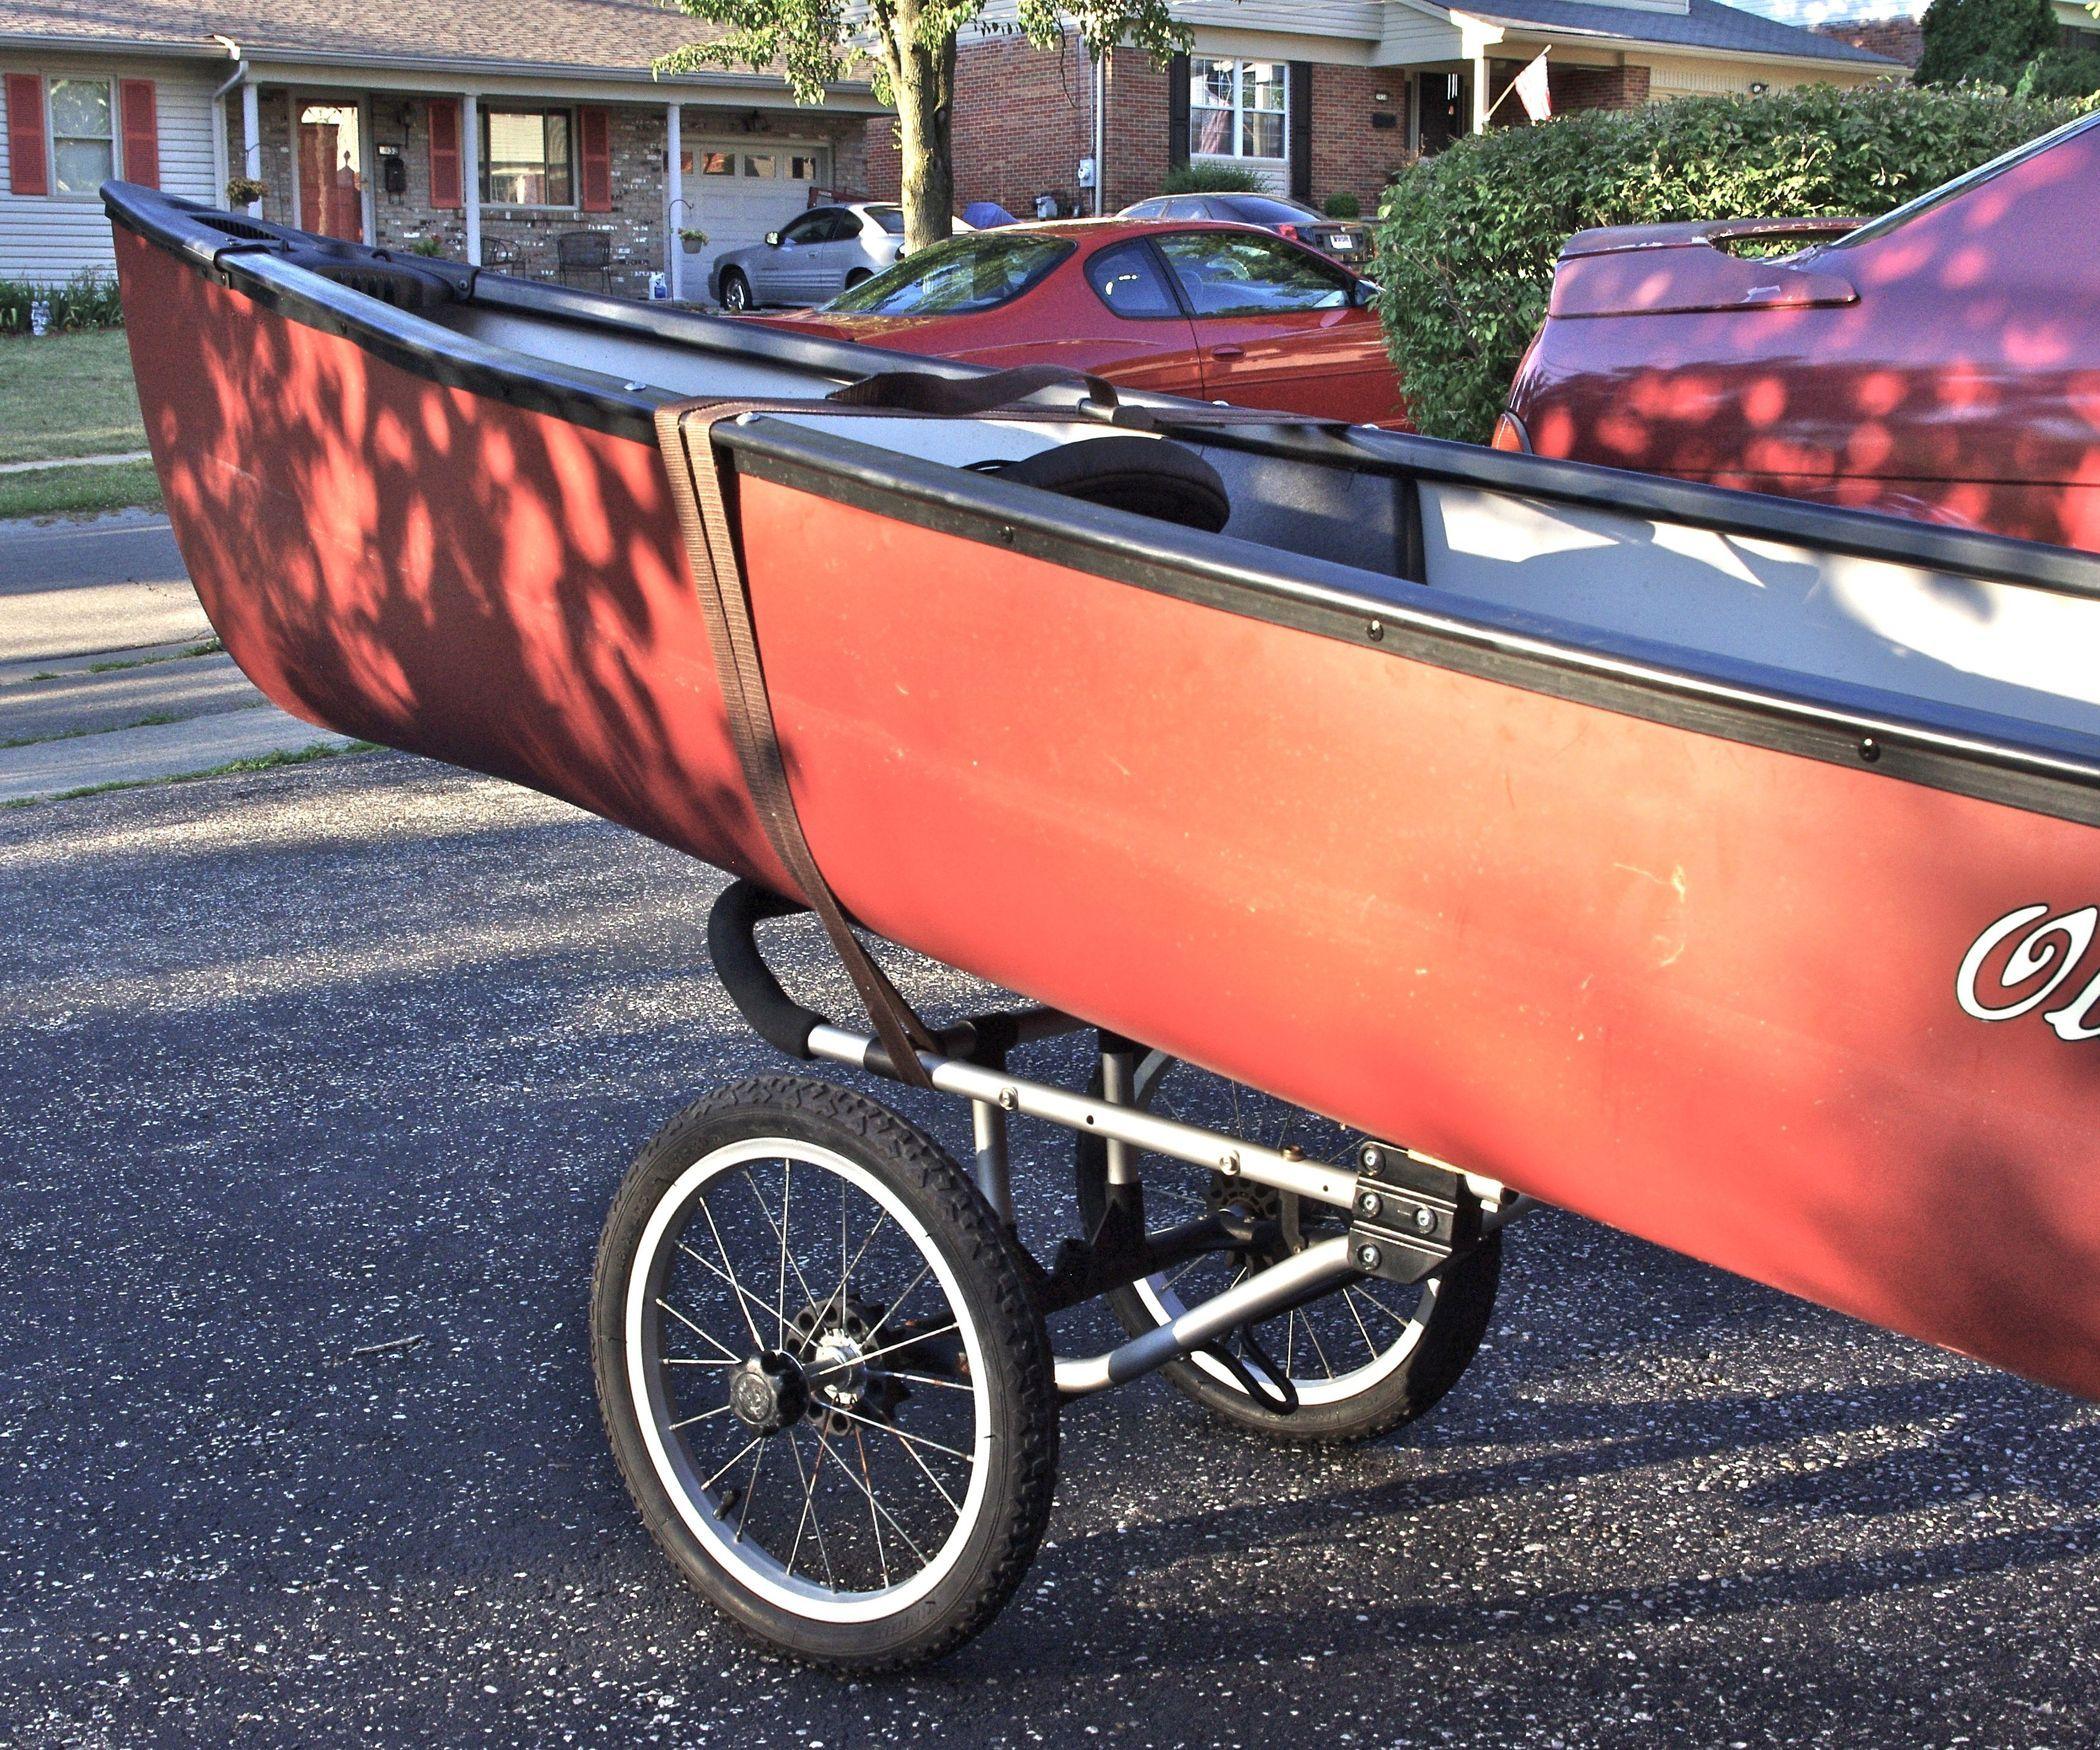 Canoe/Kayak Caddy Mod From a Jogging Stroller Canoe